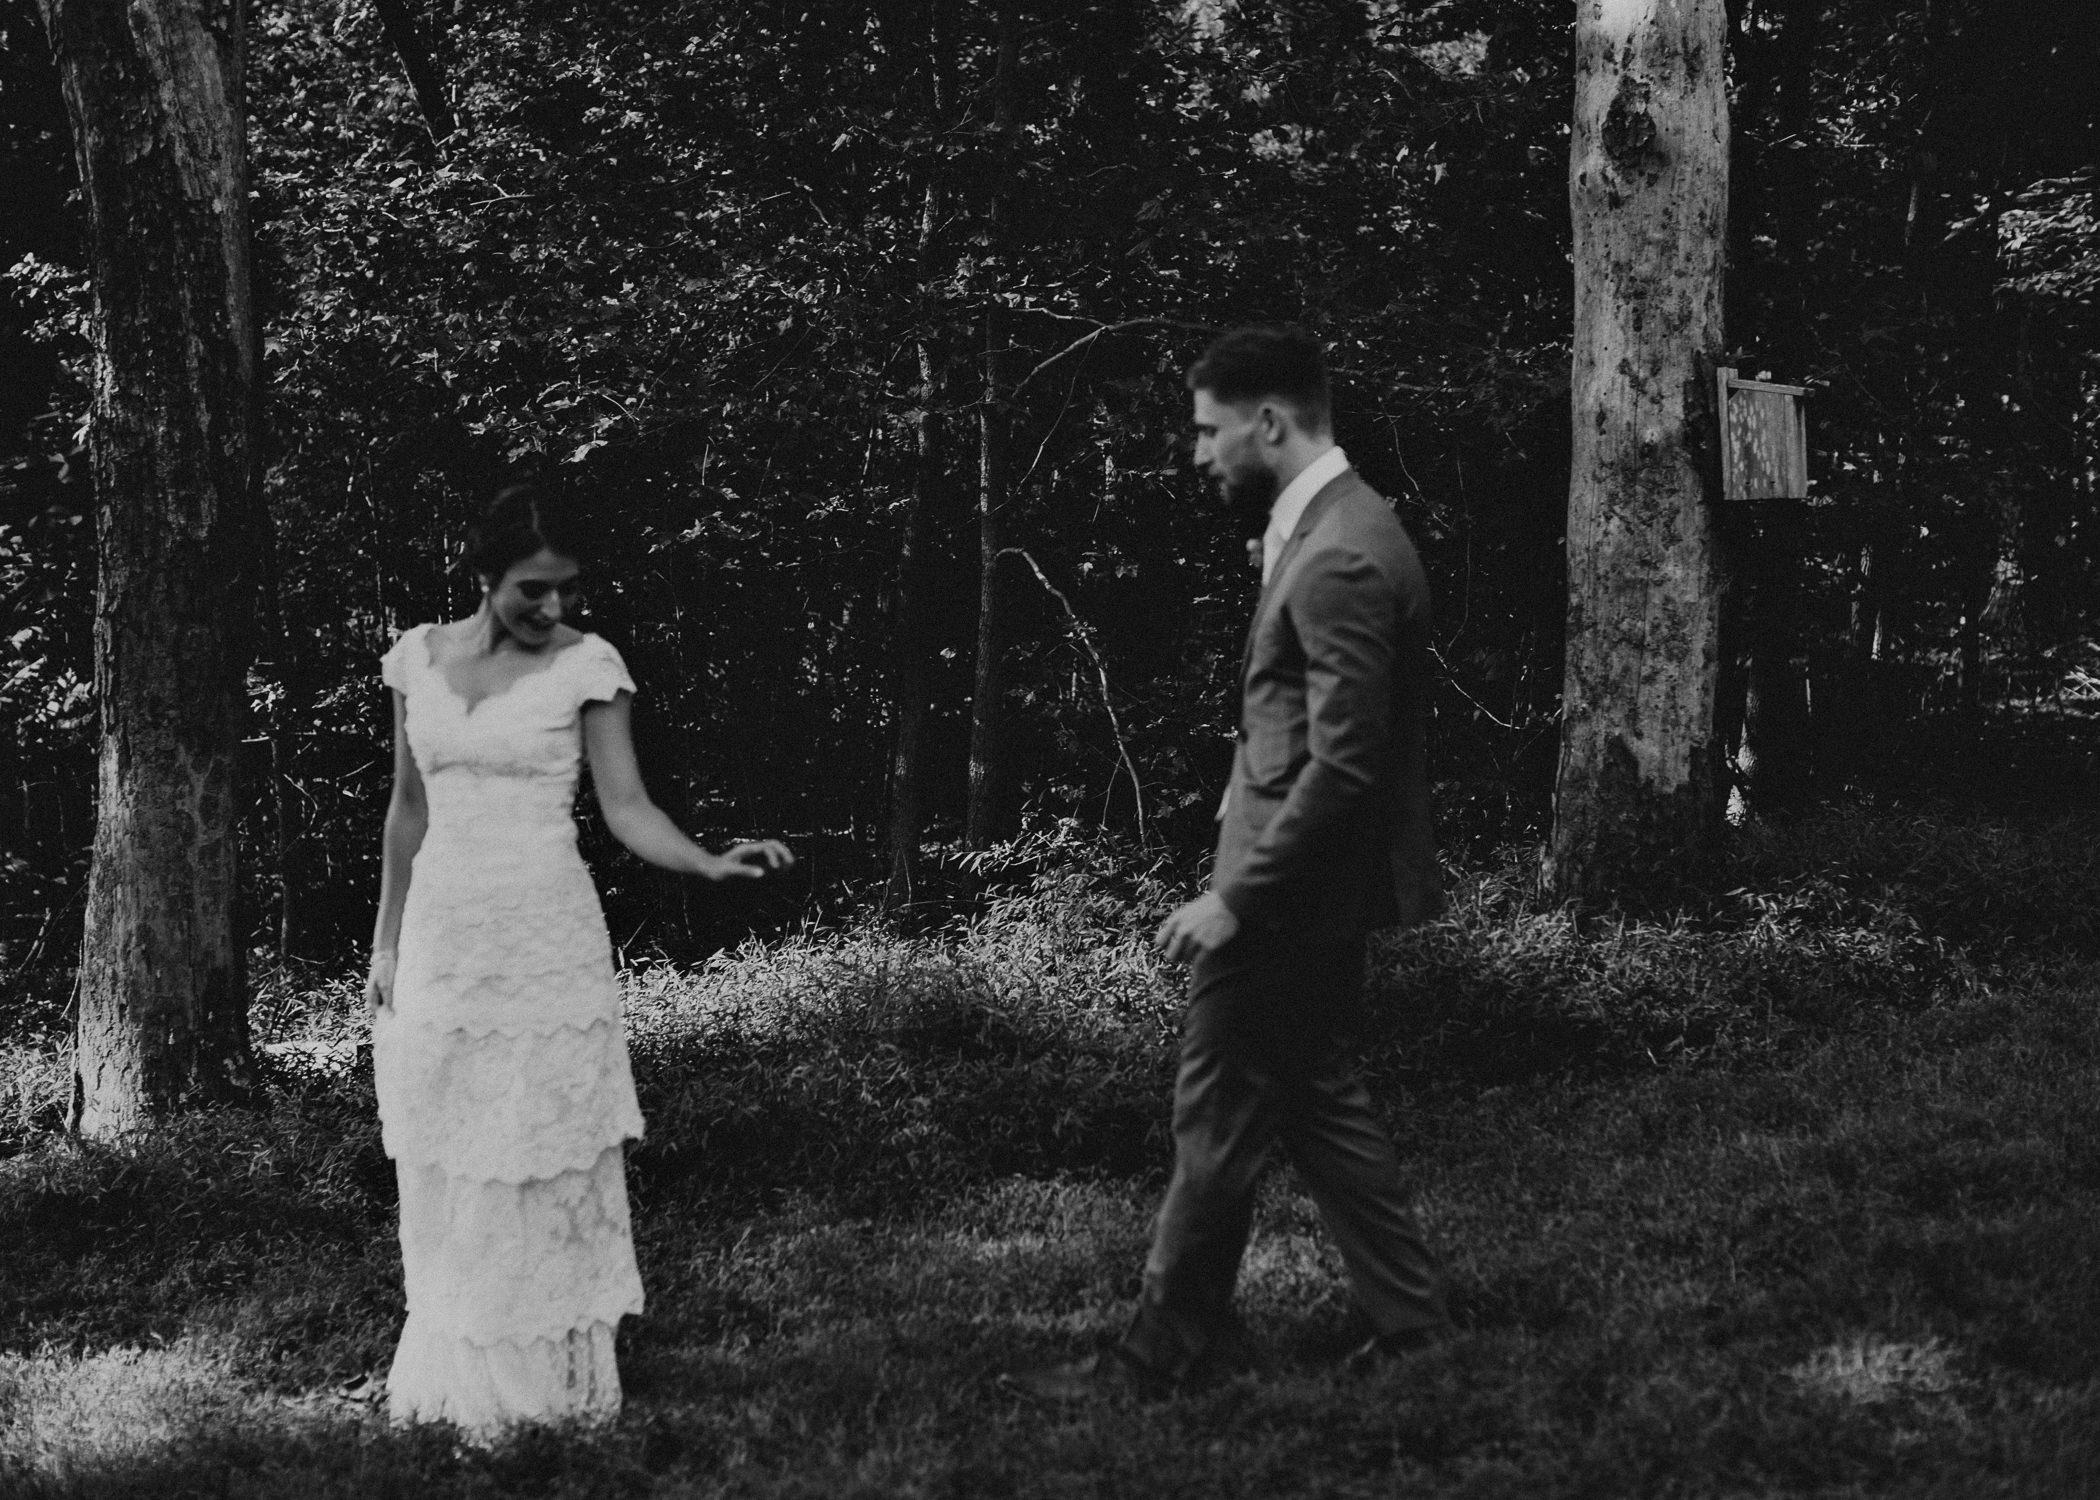 40 Bride & Groom first look before the ceremony on wedding day - Atlanta Wedding Photographer .jpg